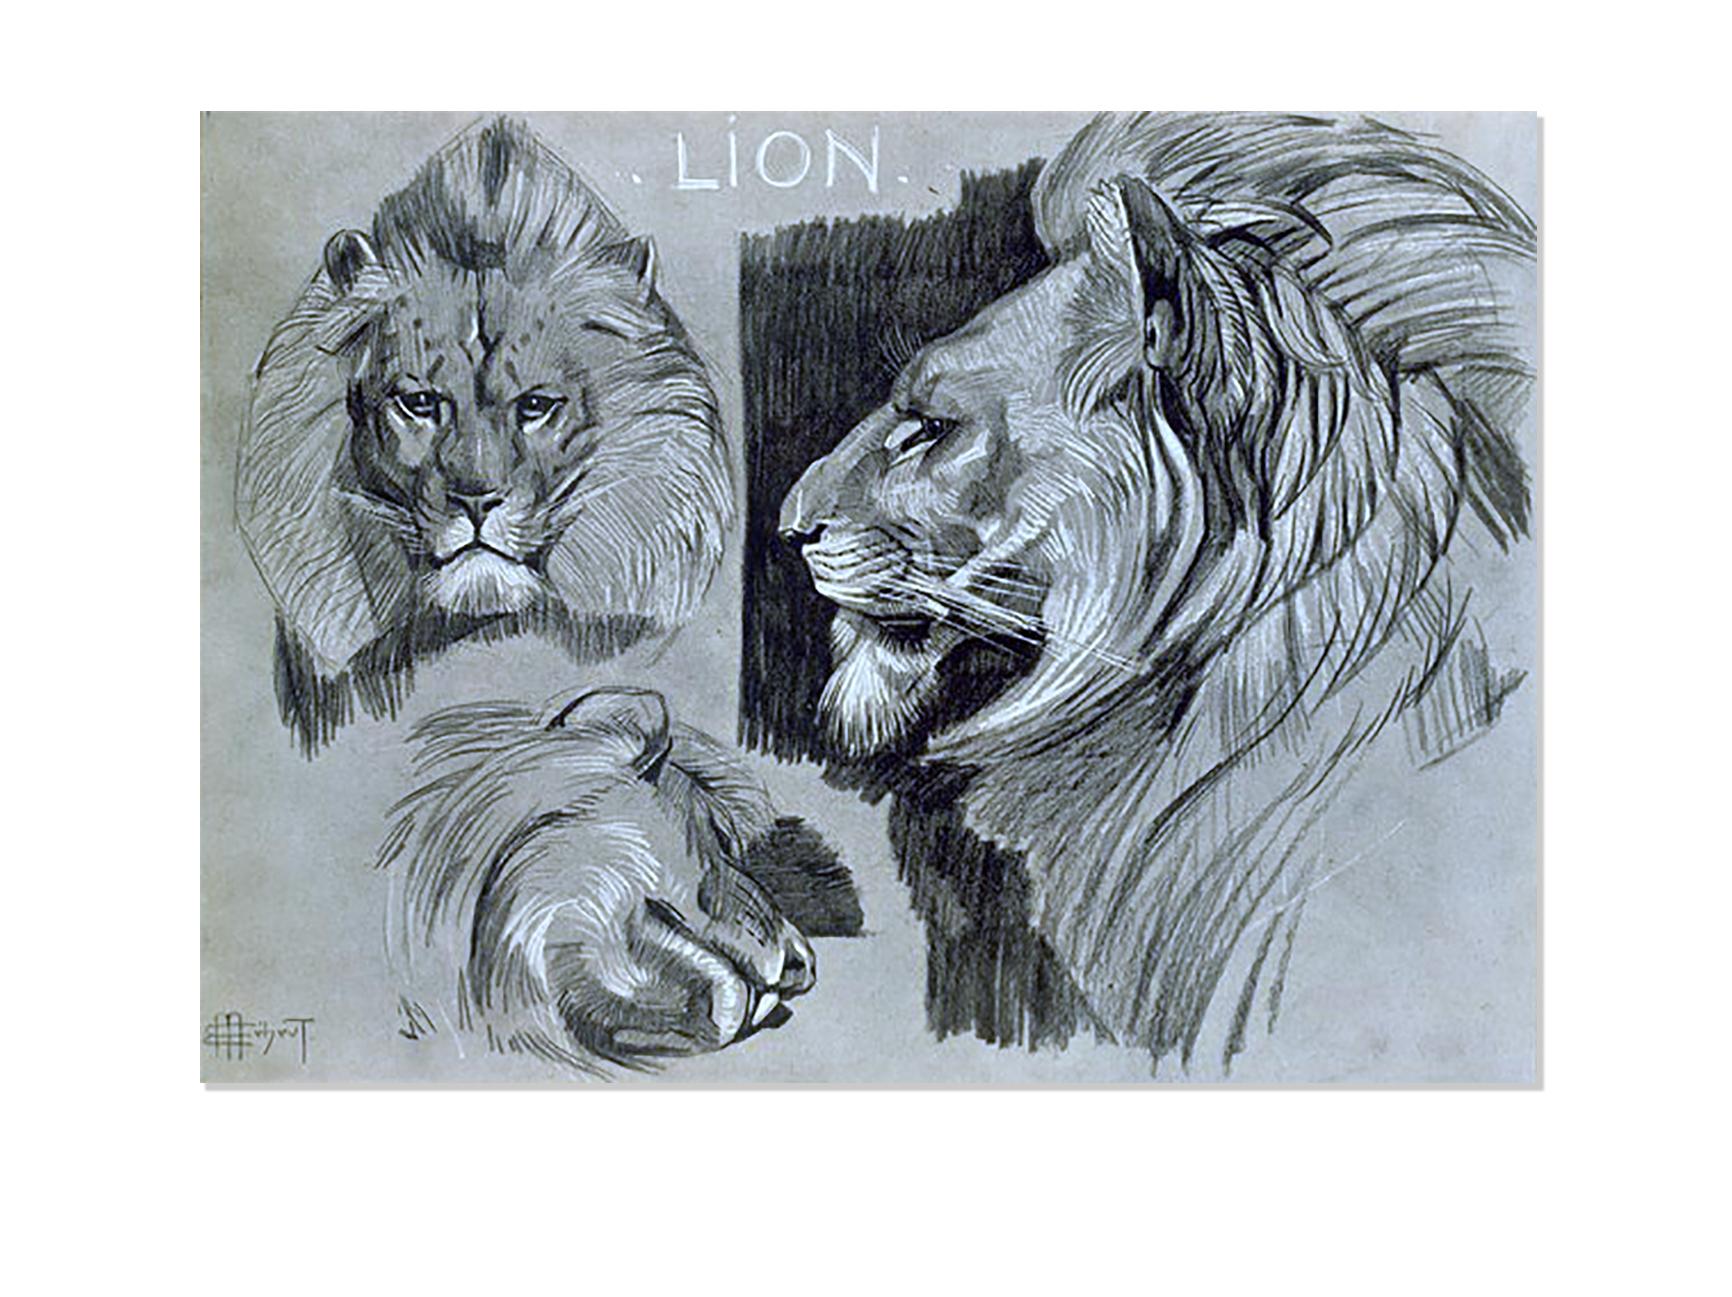 Lion - Études d'animaux, de Méheut, Mathurin, 1882-1958 (Artist) - The Digital Public Library of America-NYPL catalog ID (B-number): b13983745